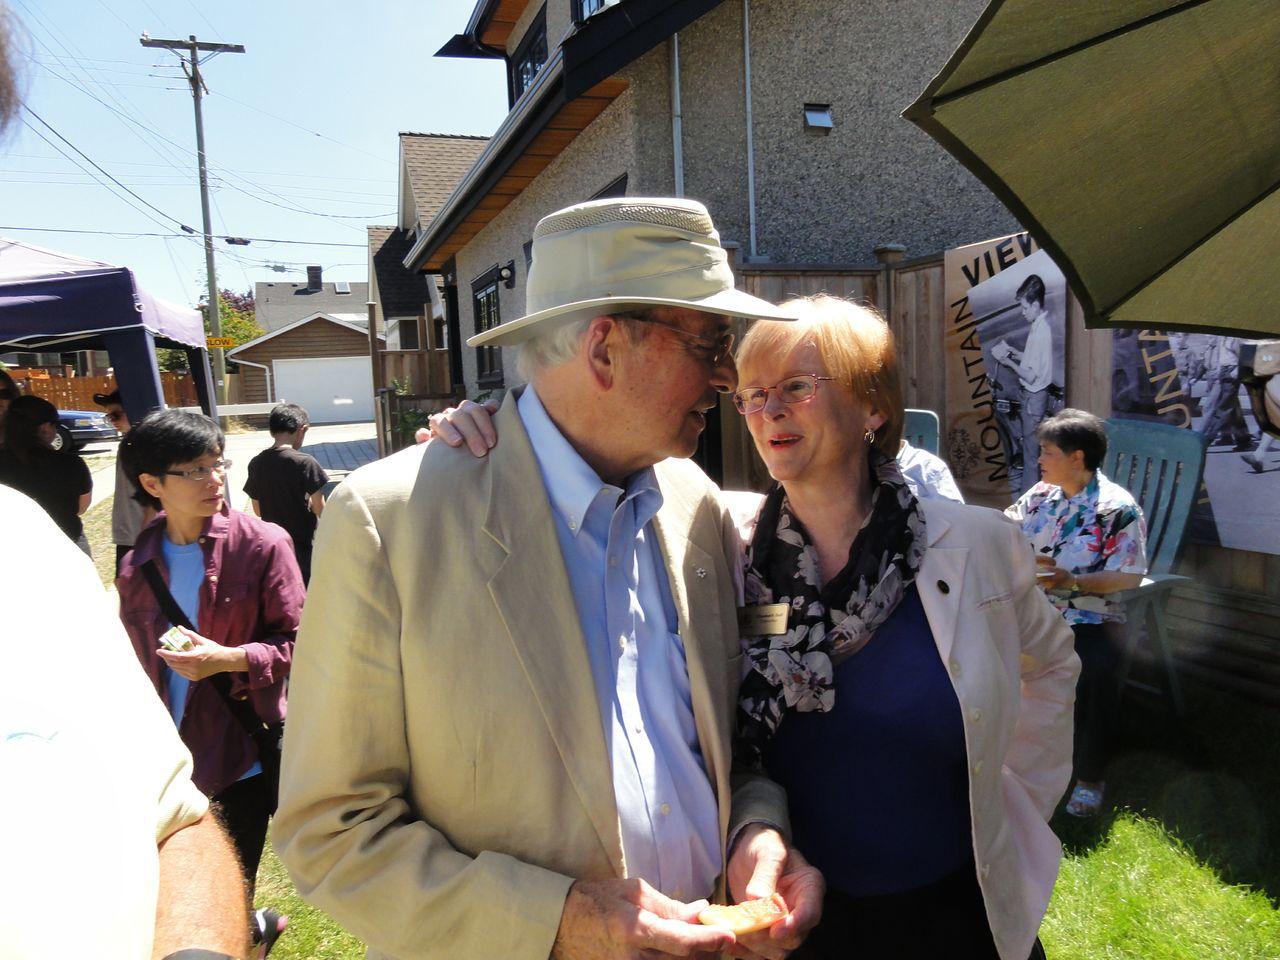 Former Vancouver mayor Philip Owen, standing with City Councillor Elizabeth Ball